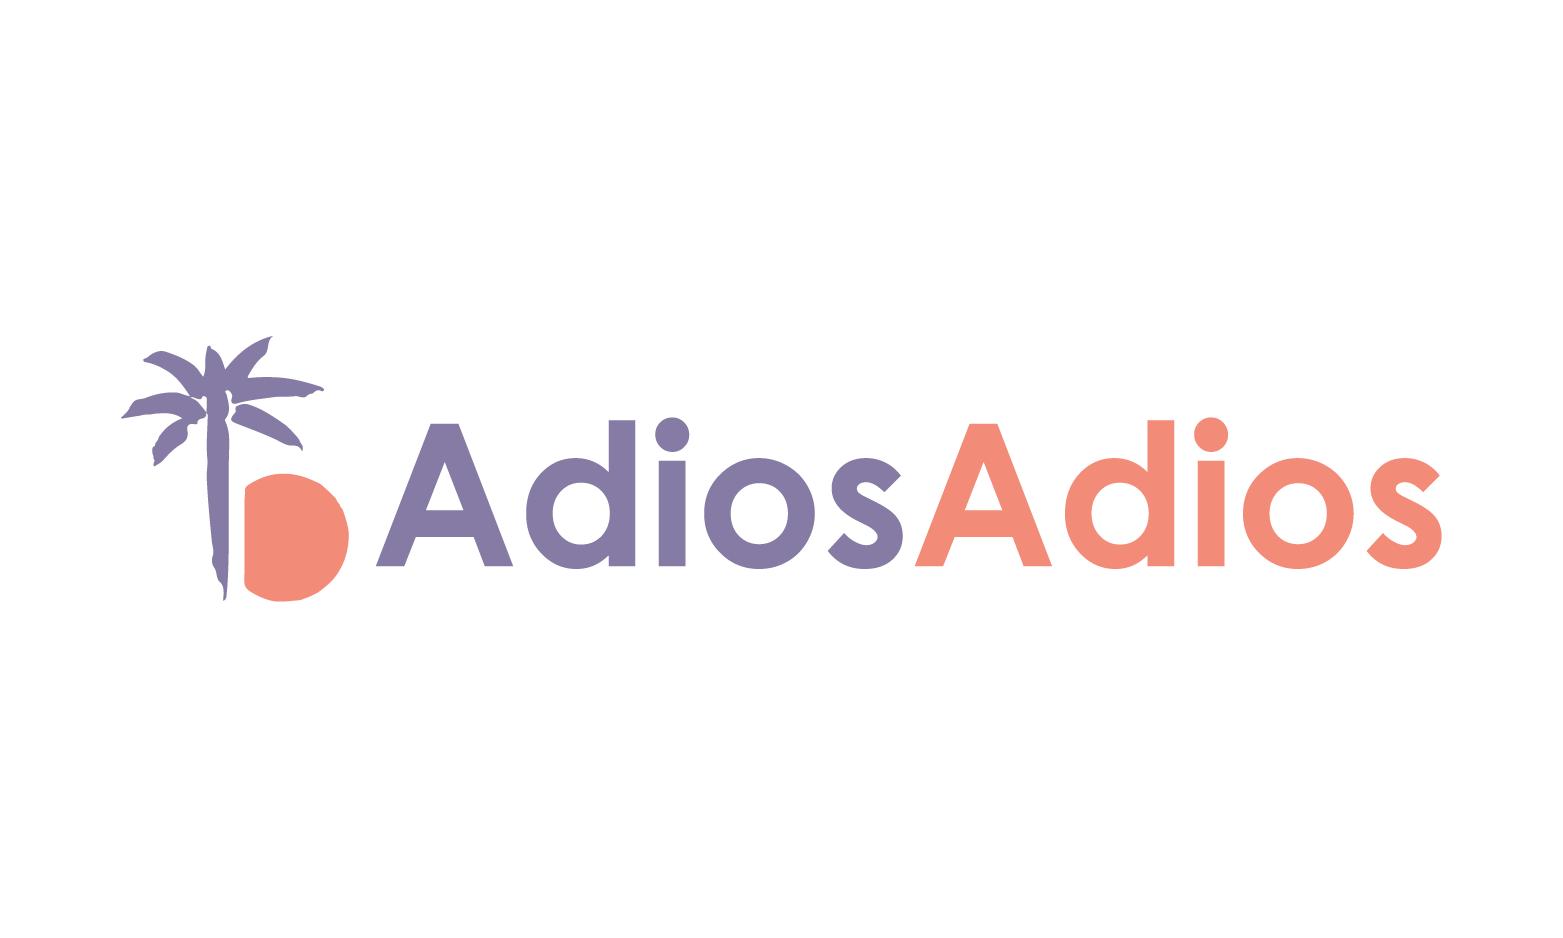 AdiosAdios.com